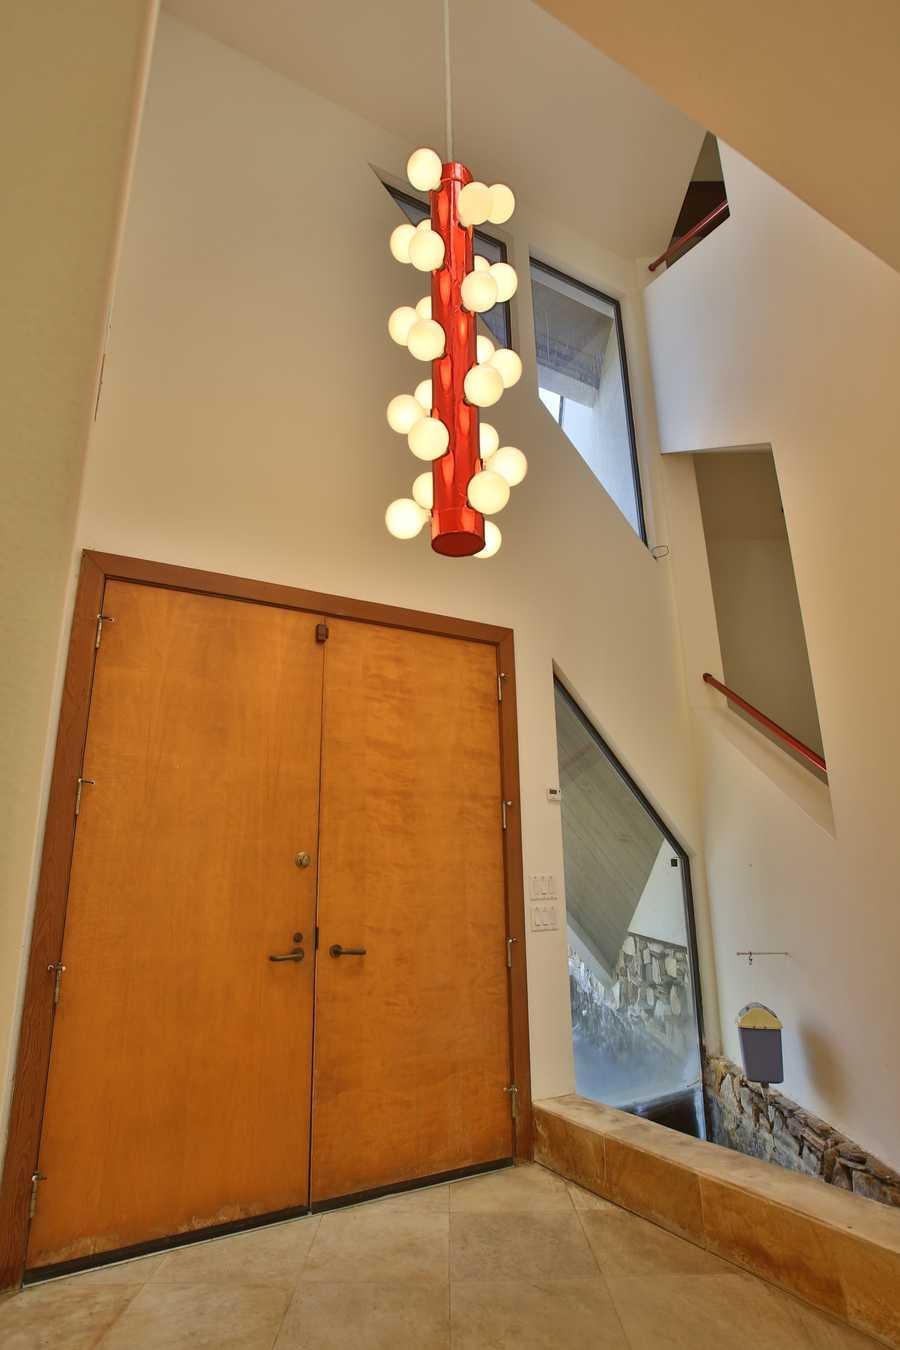 Foyer features vaulted ceiling and Brazilian quartz tile.